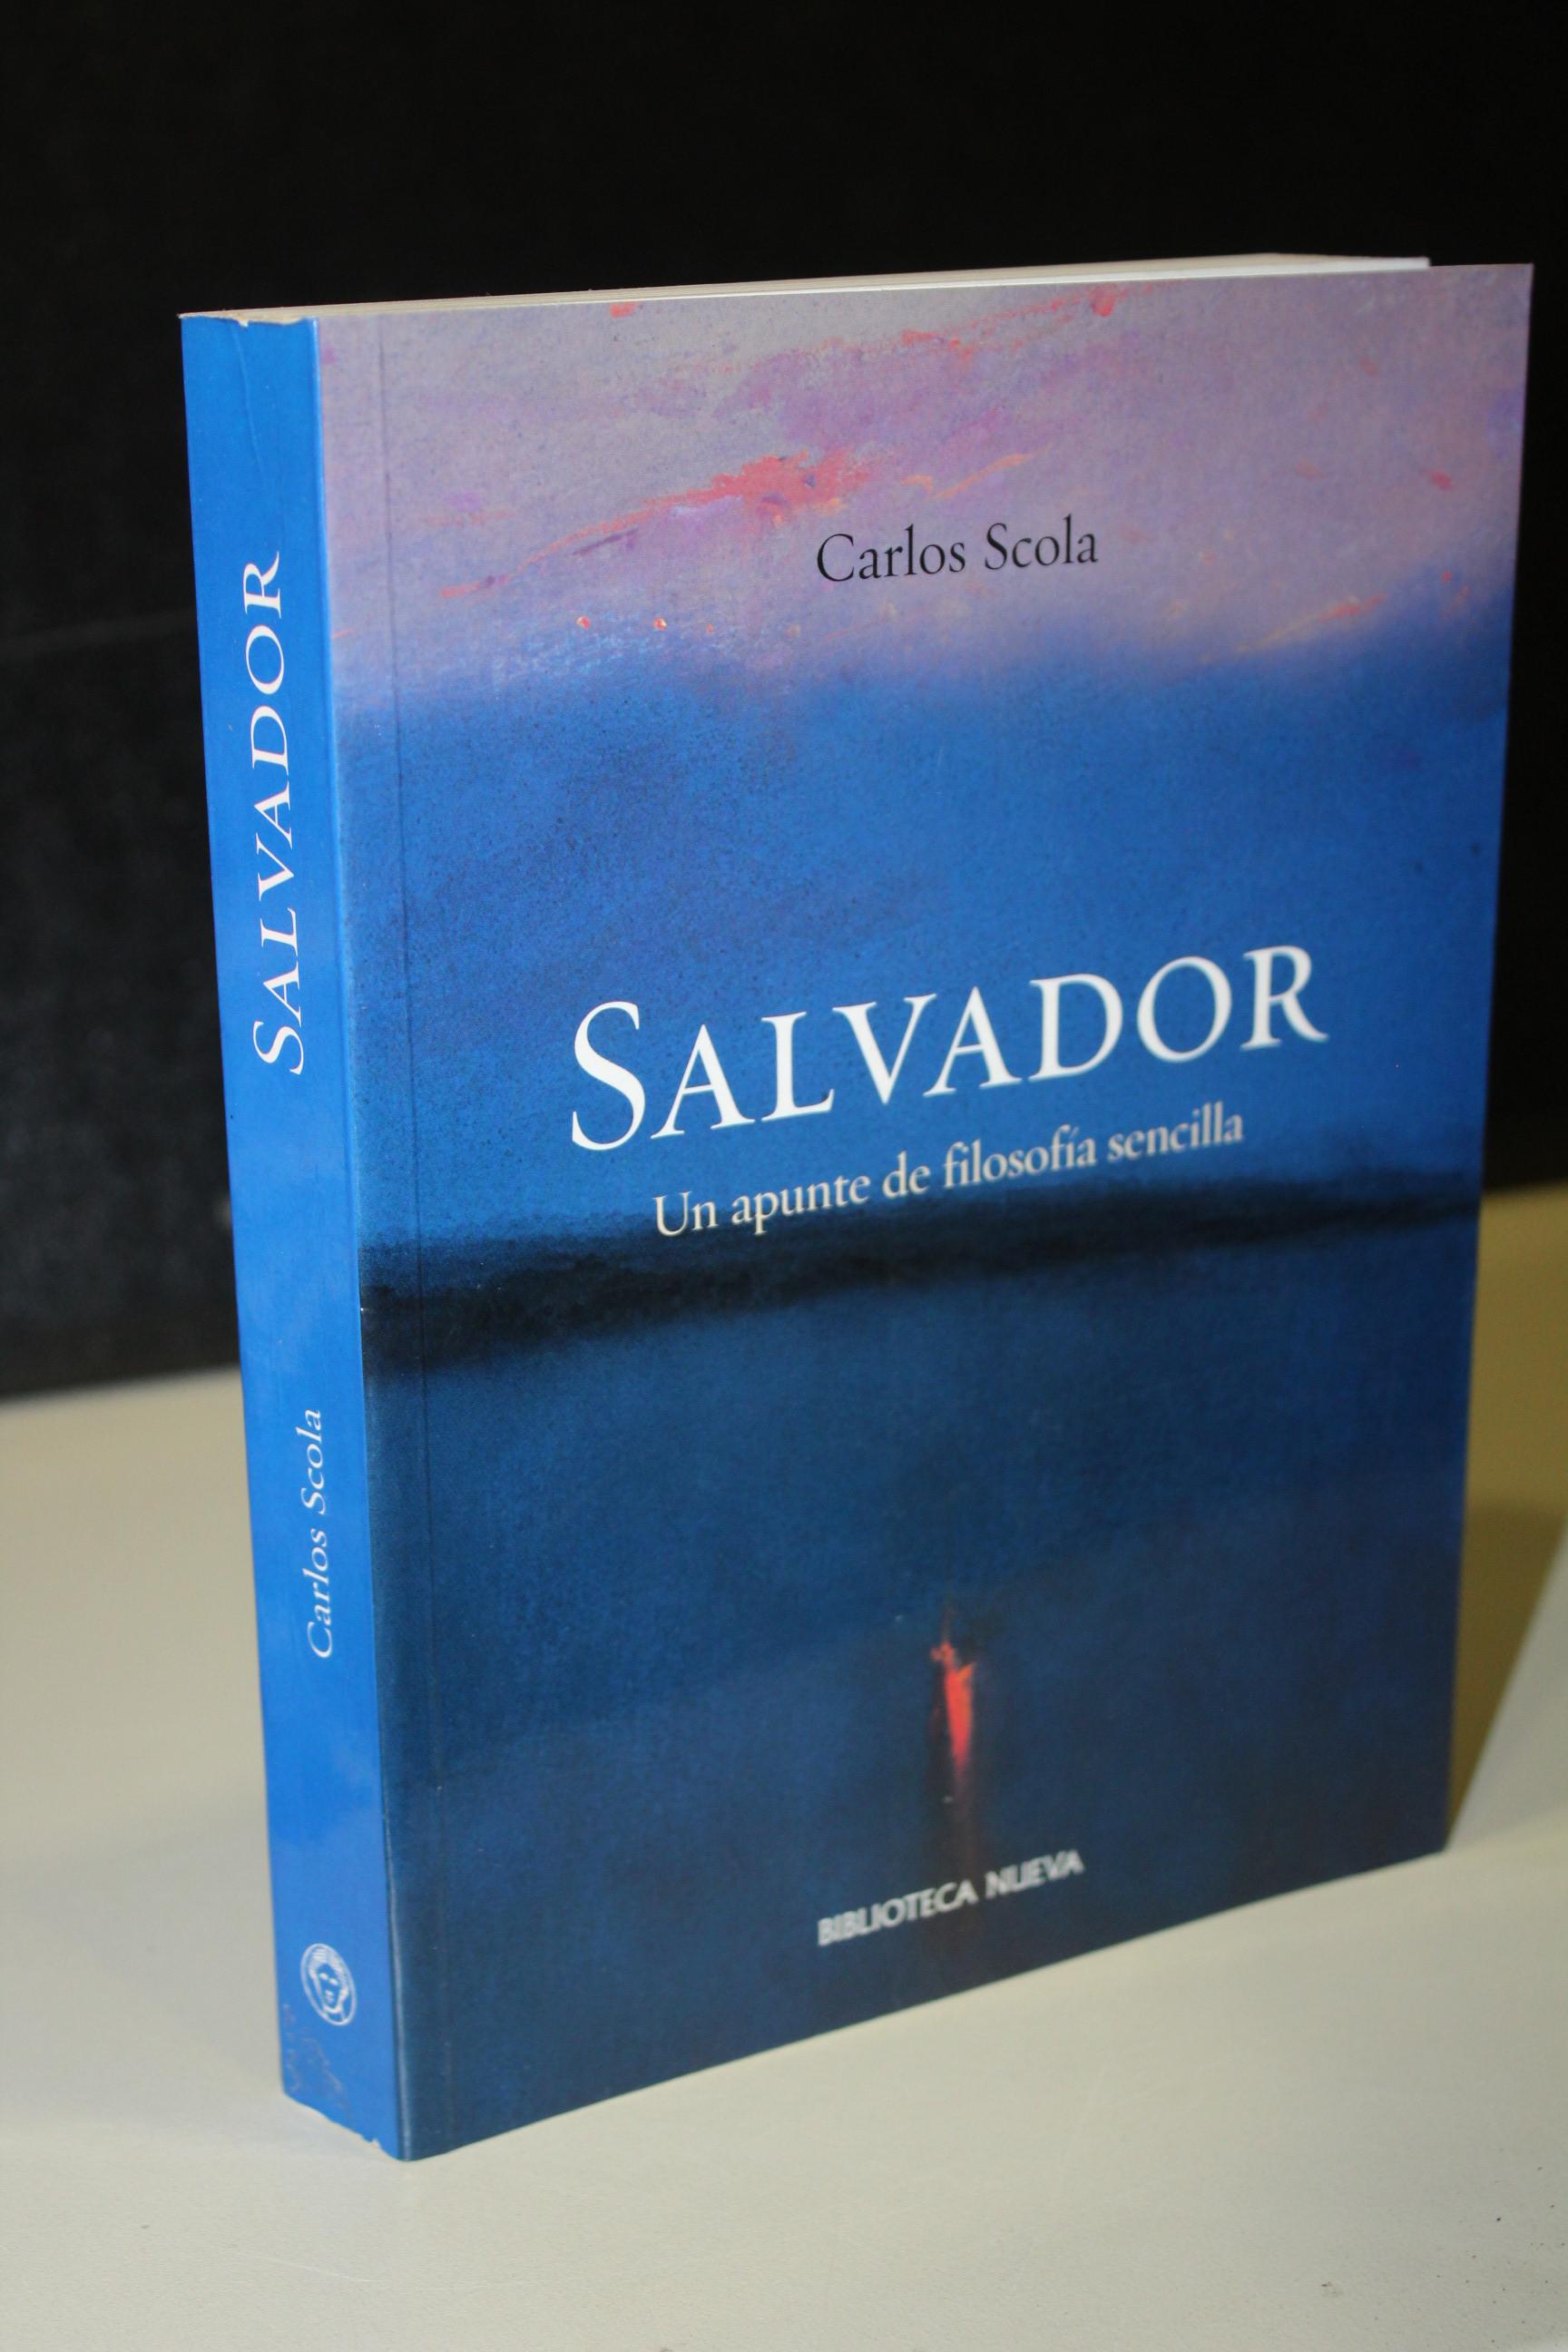 Carlos Scola Pliego Books Abebooks